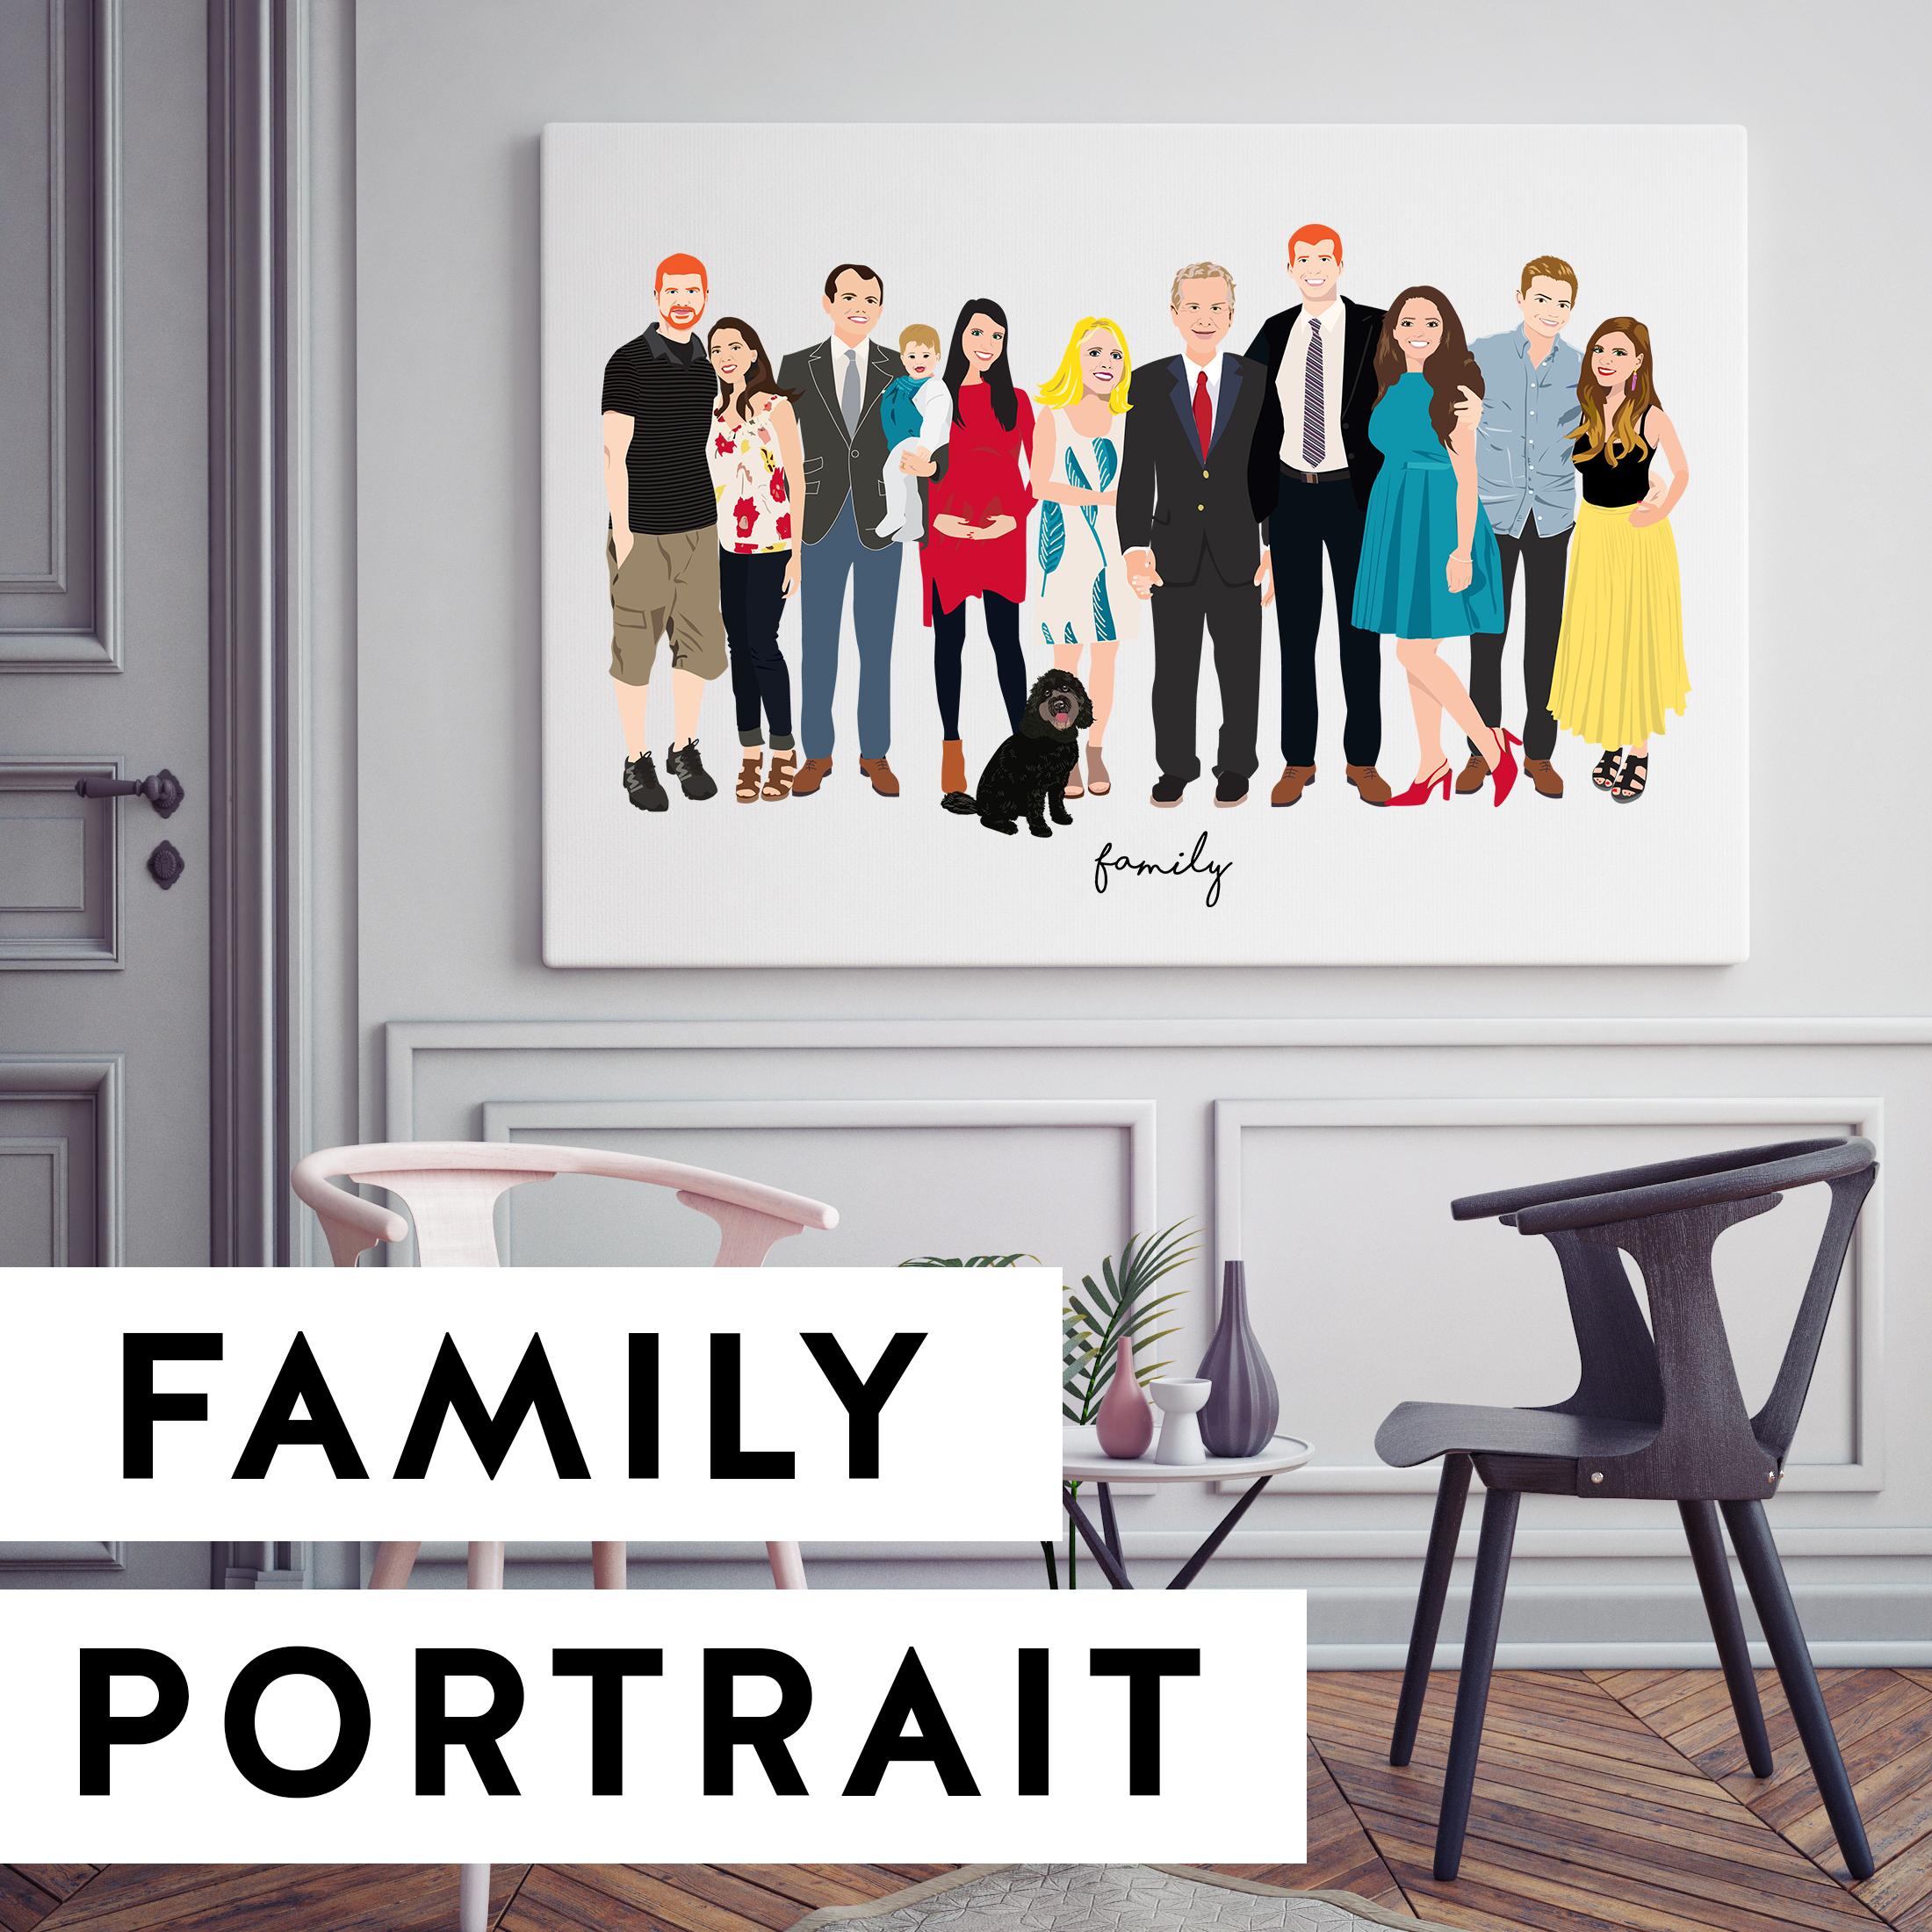 MockUp_Family-Portrait-1.jpg